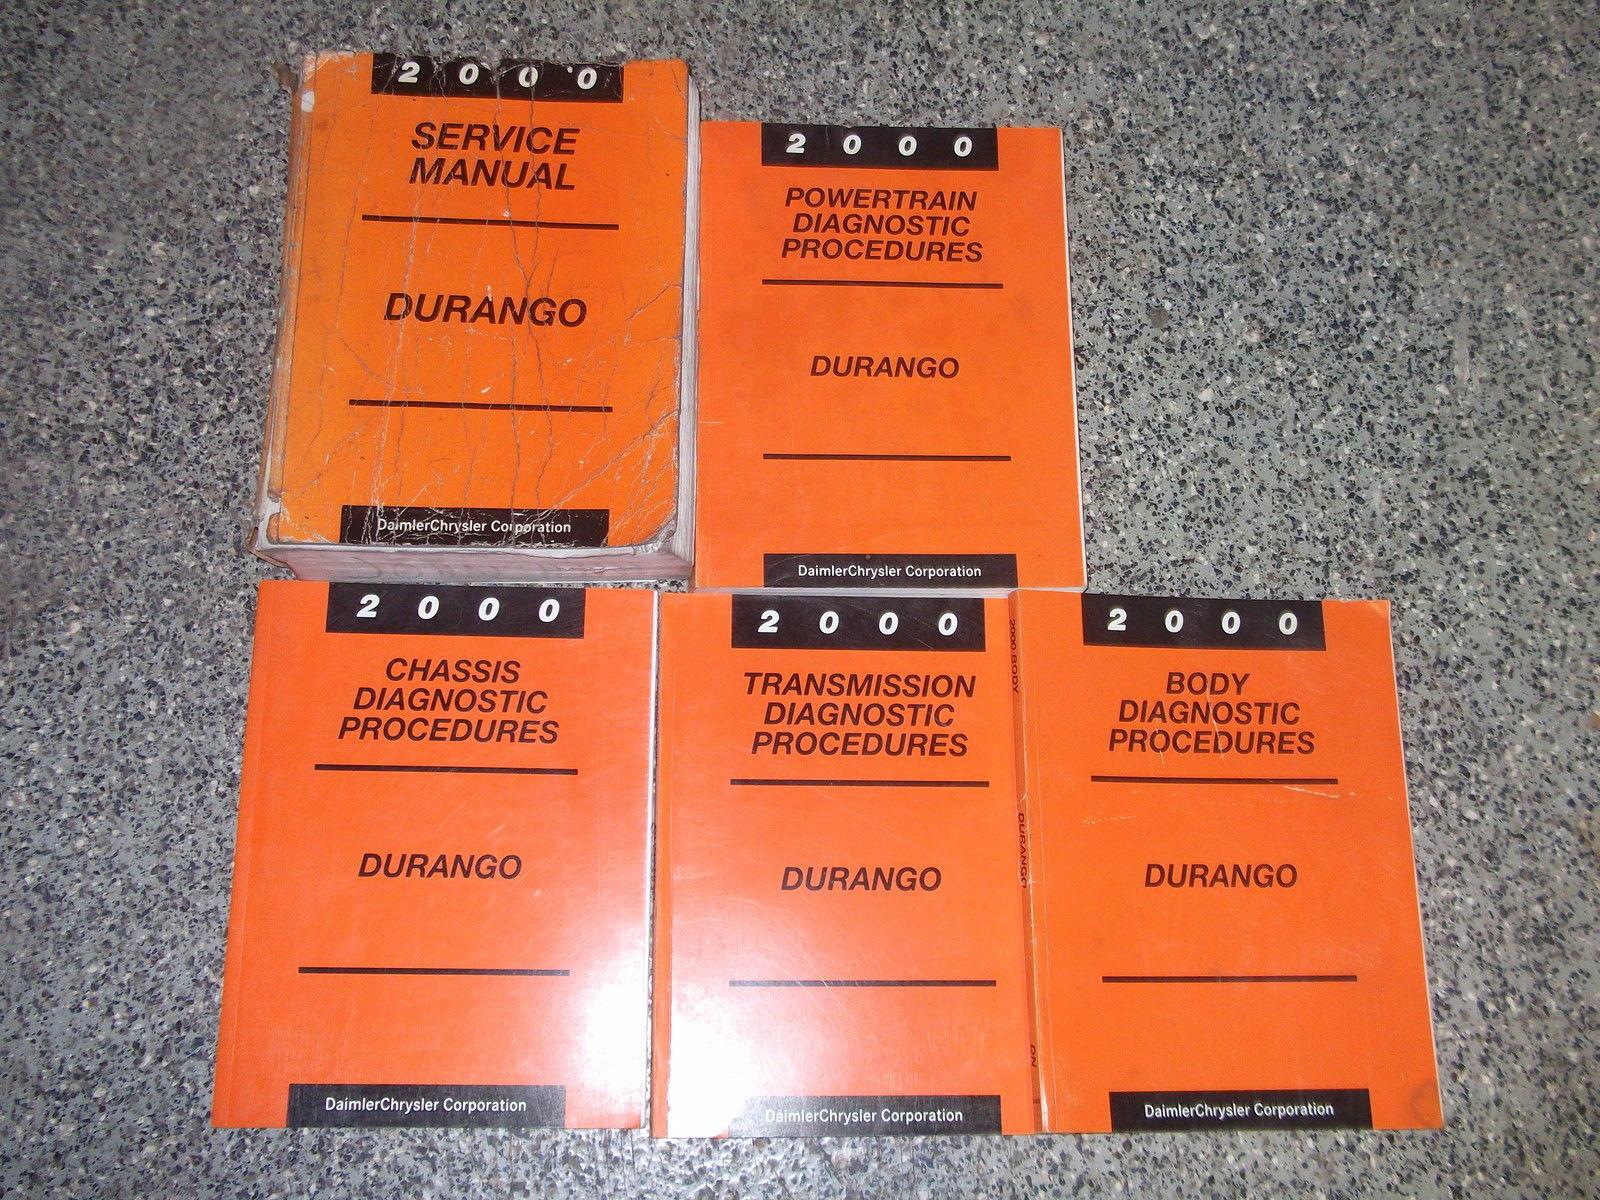 2000 Dodge Durango Service Repair Shop Manual Set OEM FACTORY BOOKS MOPAR 2000